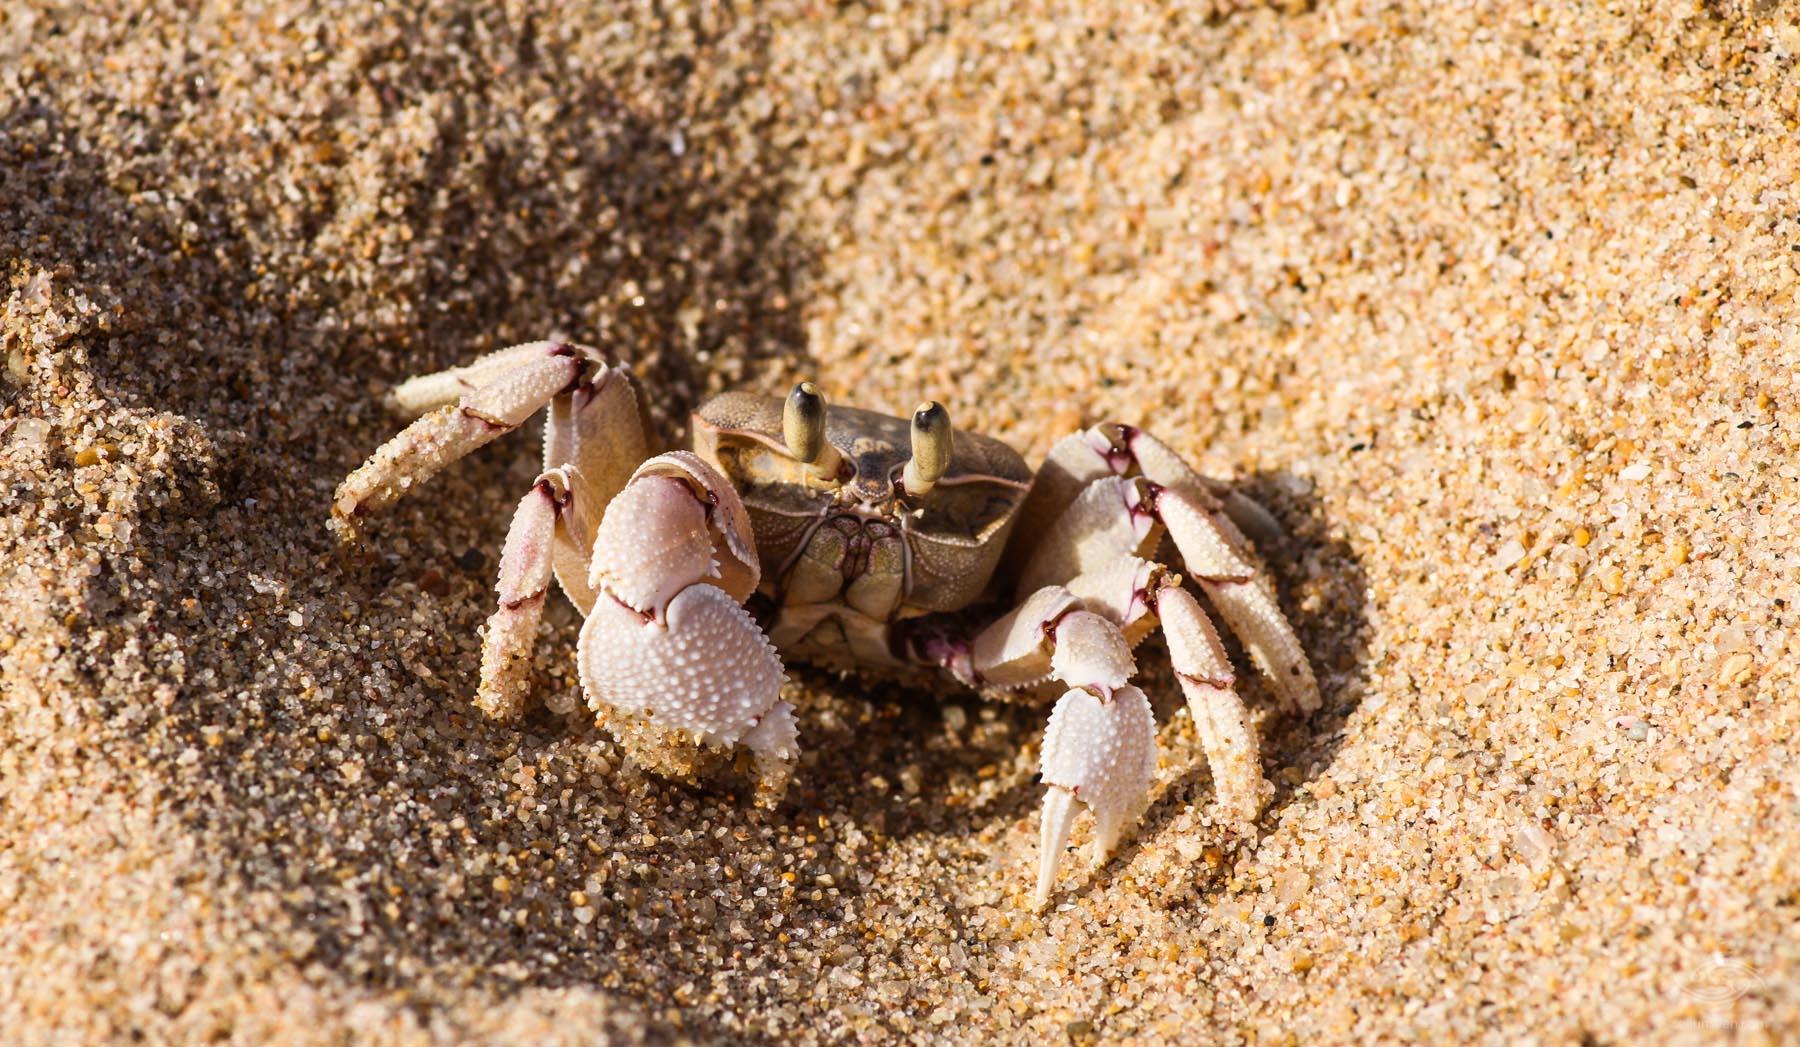 A pink ghost crab Ocypode ryderi